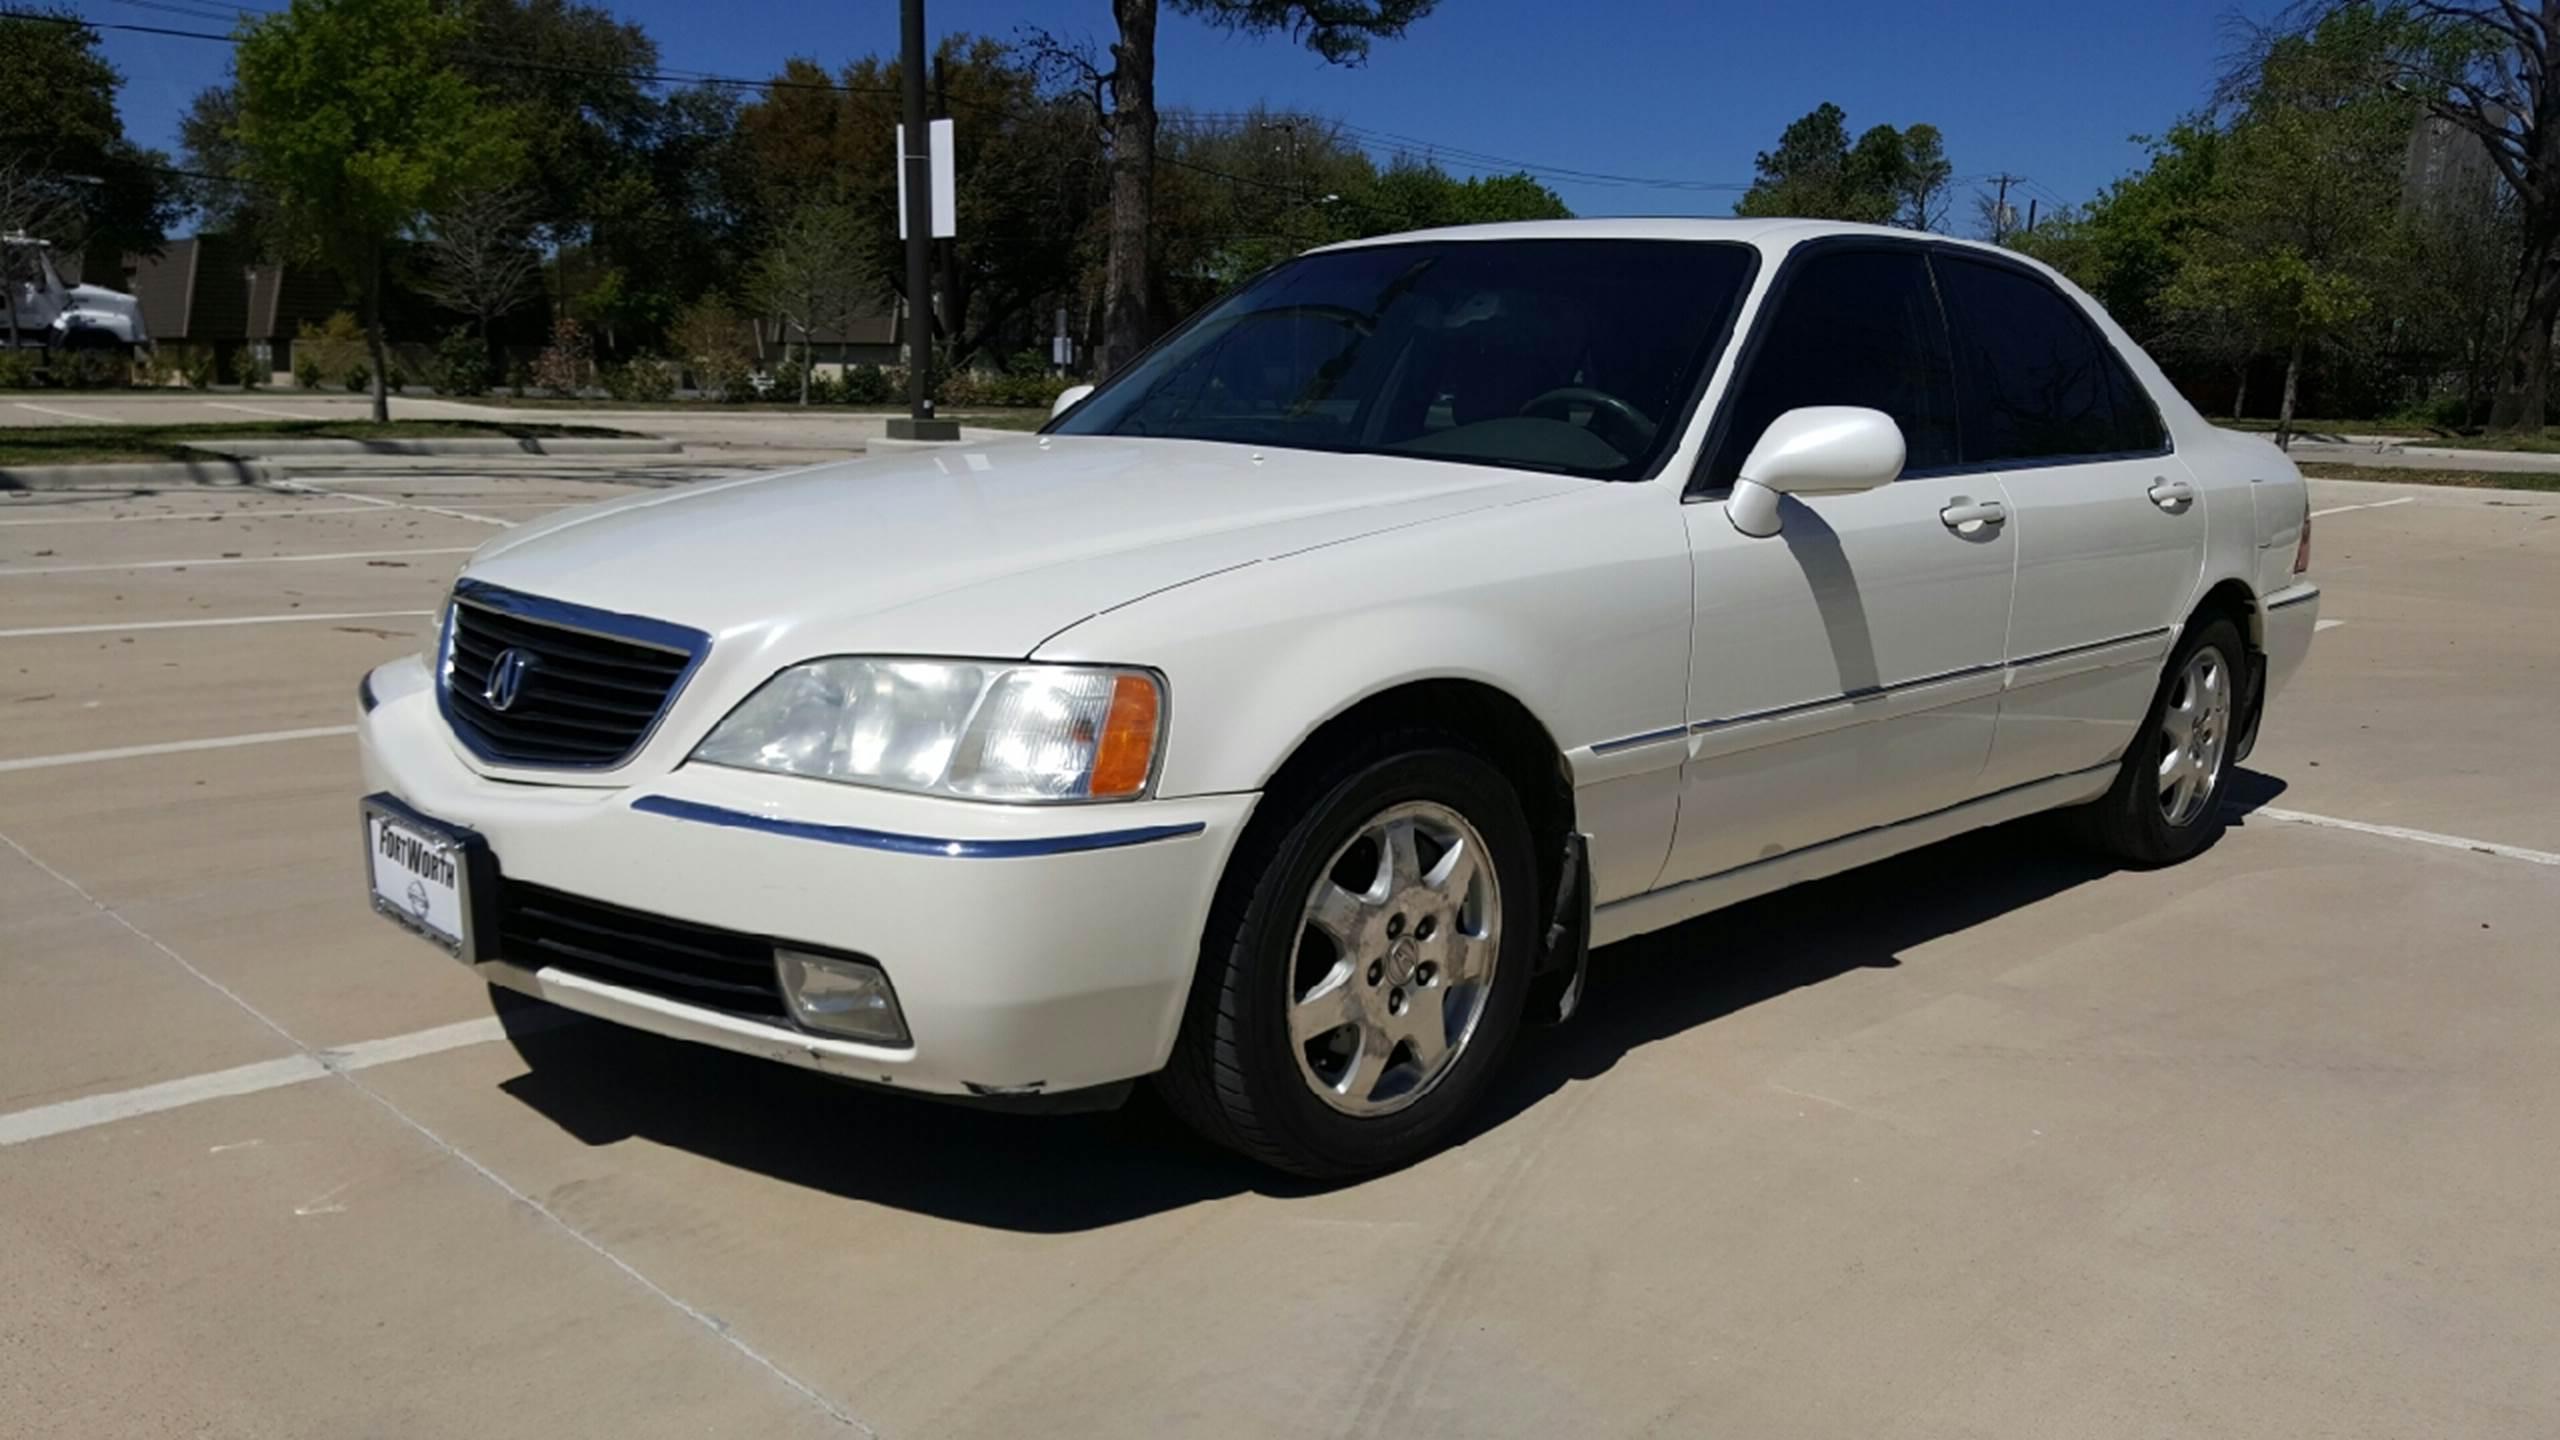 2002 Acura RL for sale at Safe Trip Auto Sales in Dallas TX